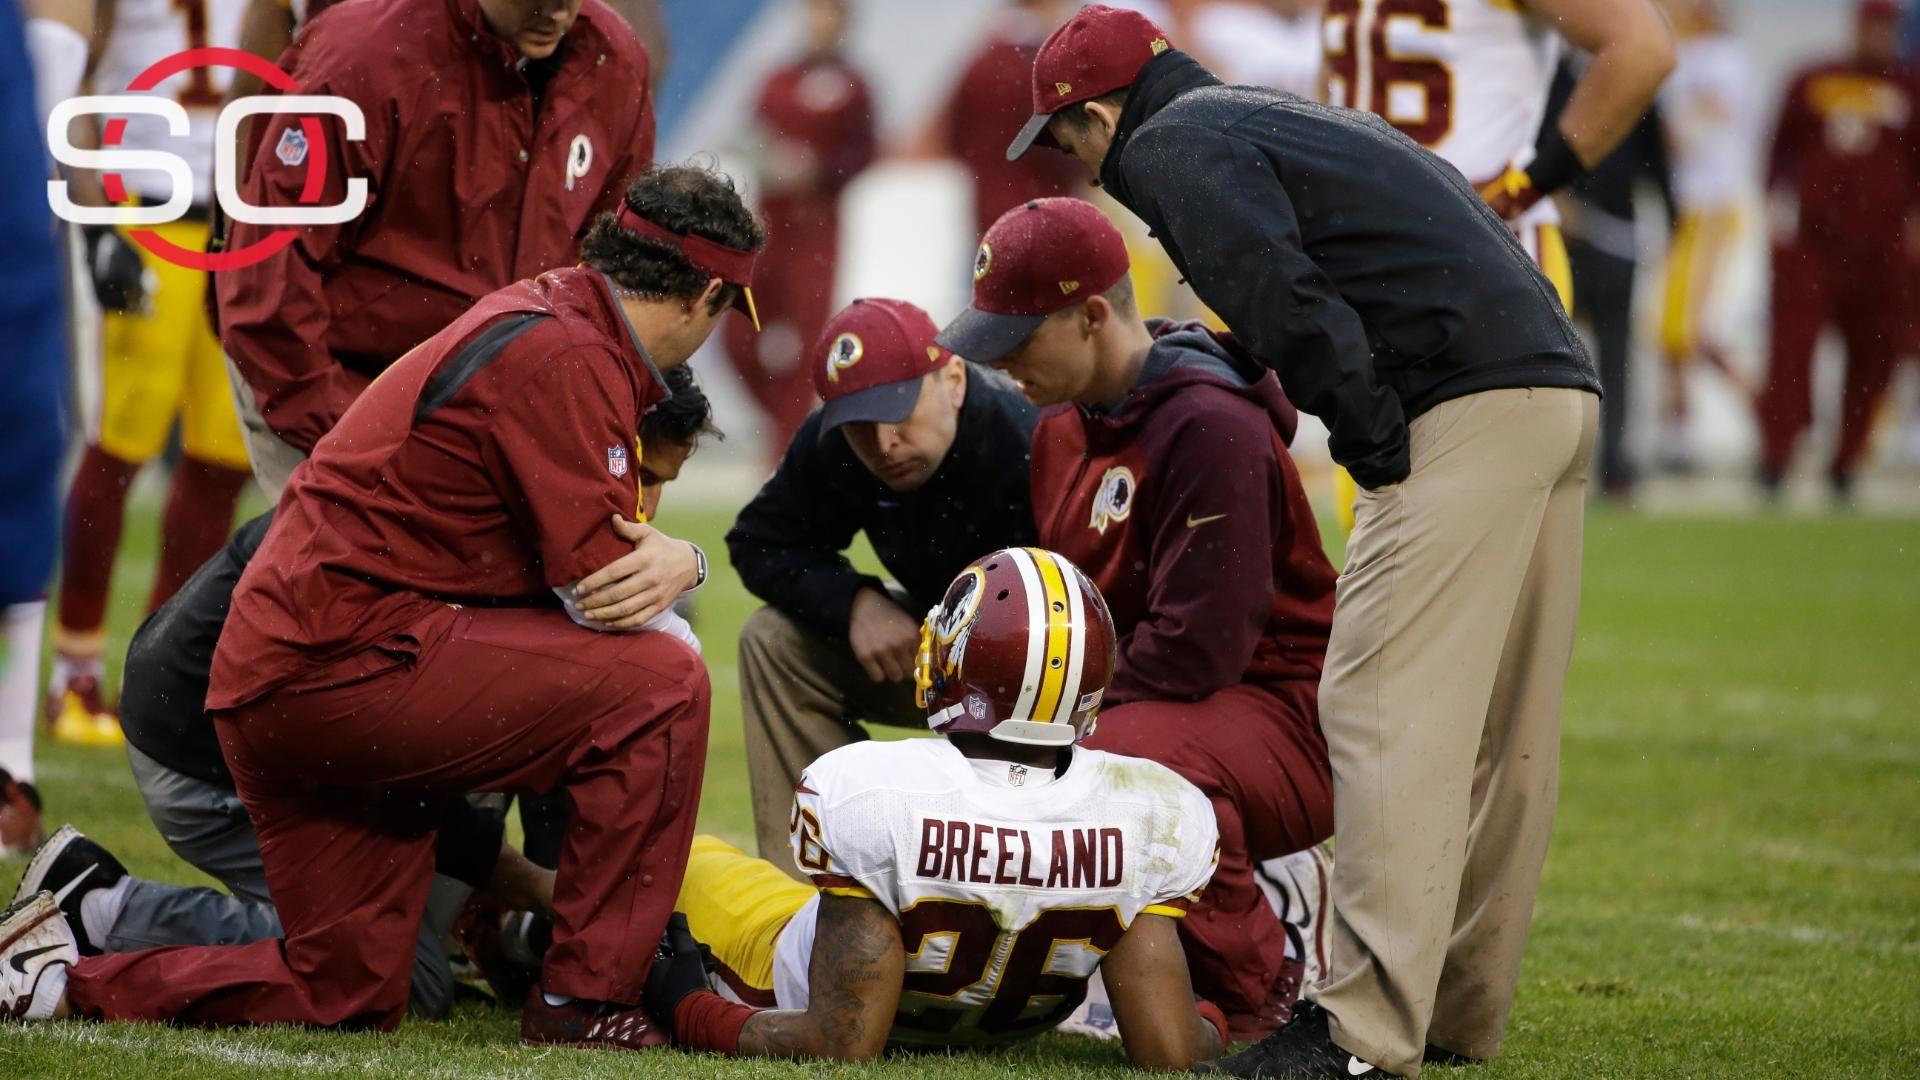 Yates: Redskins stolen medical info an unfortunate case of bad luck